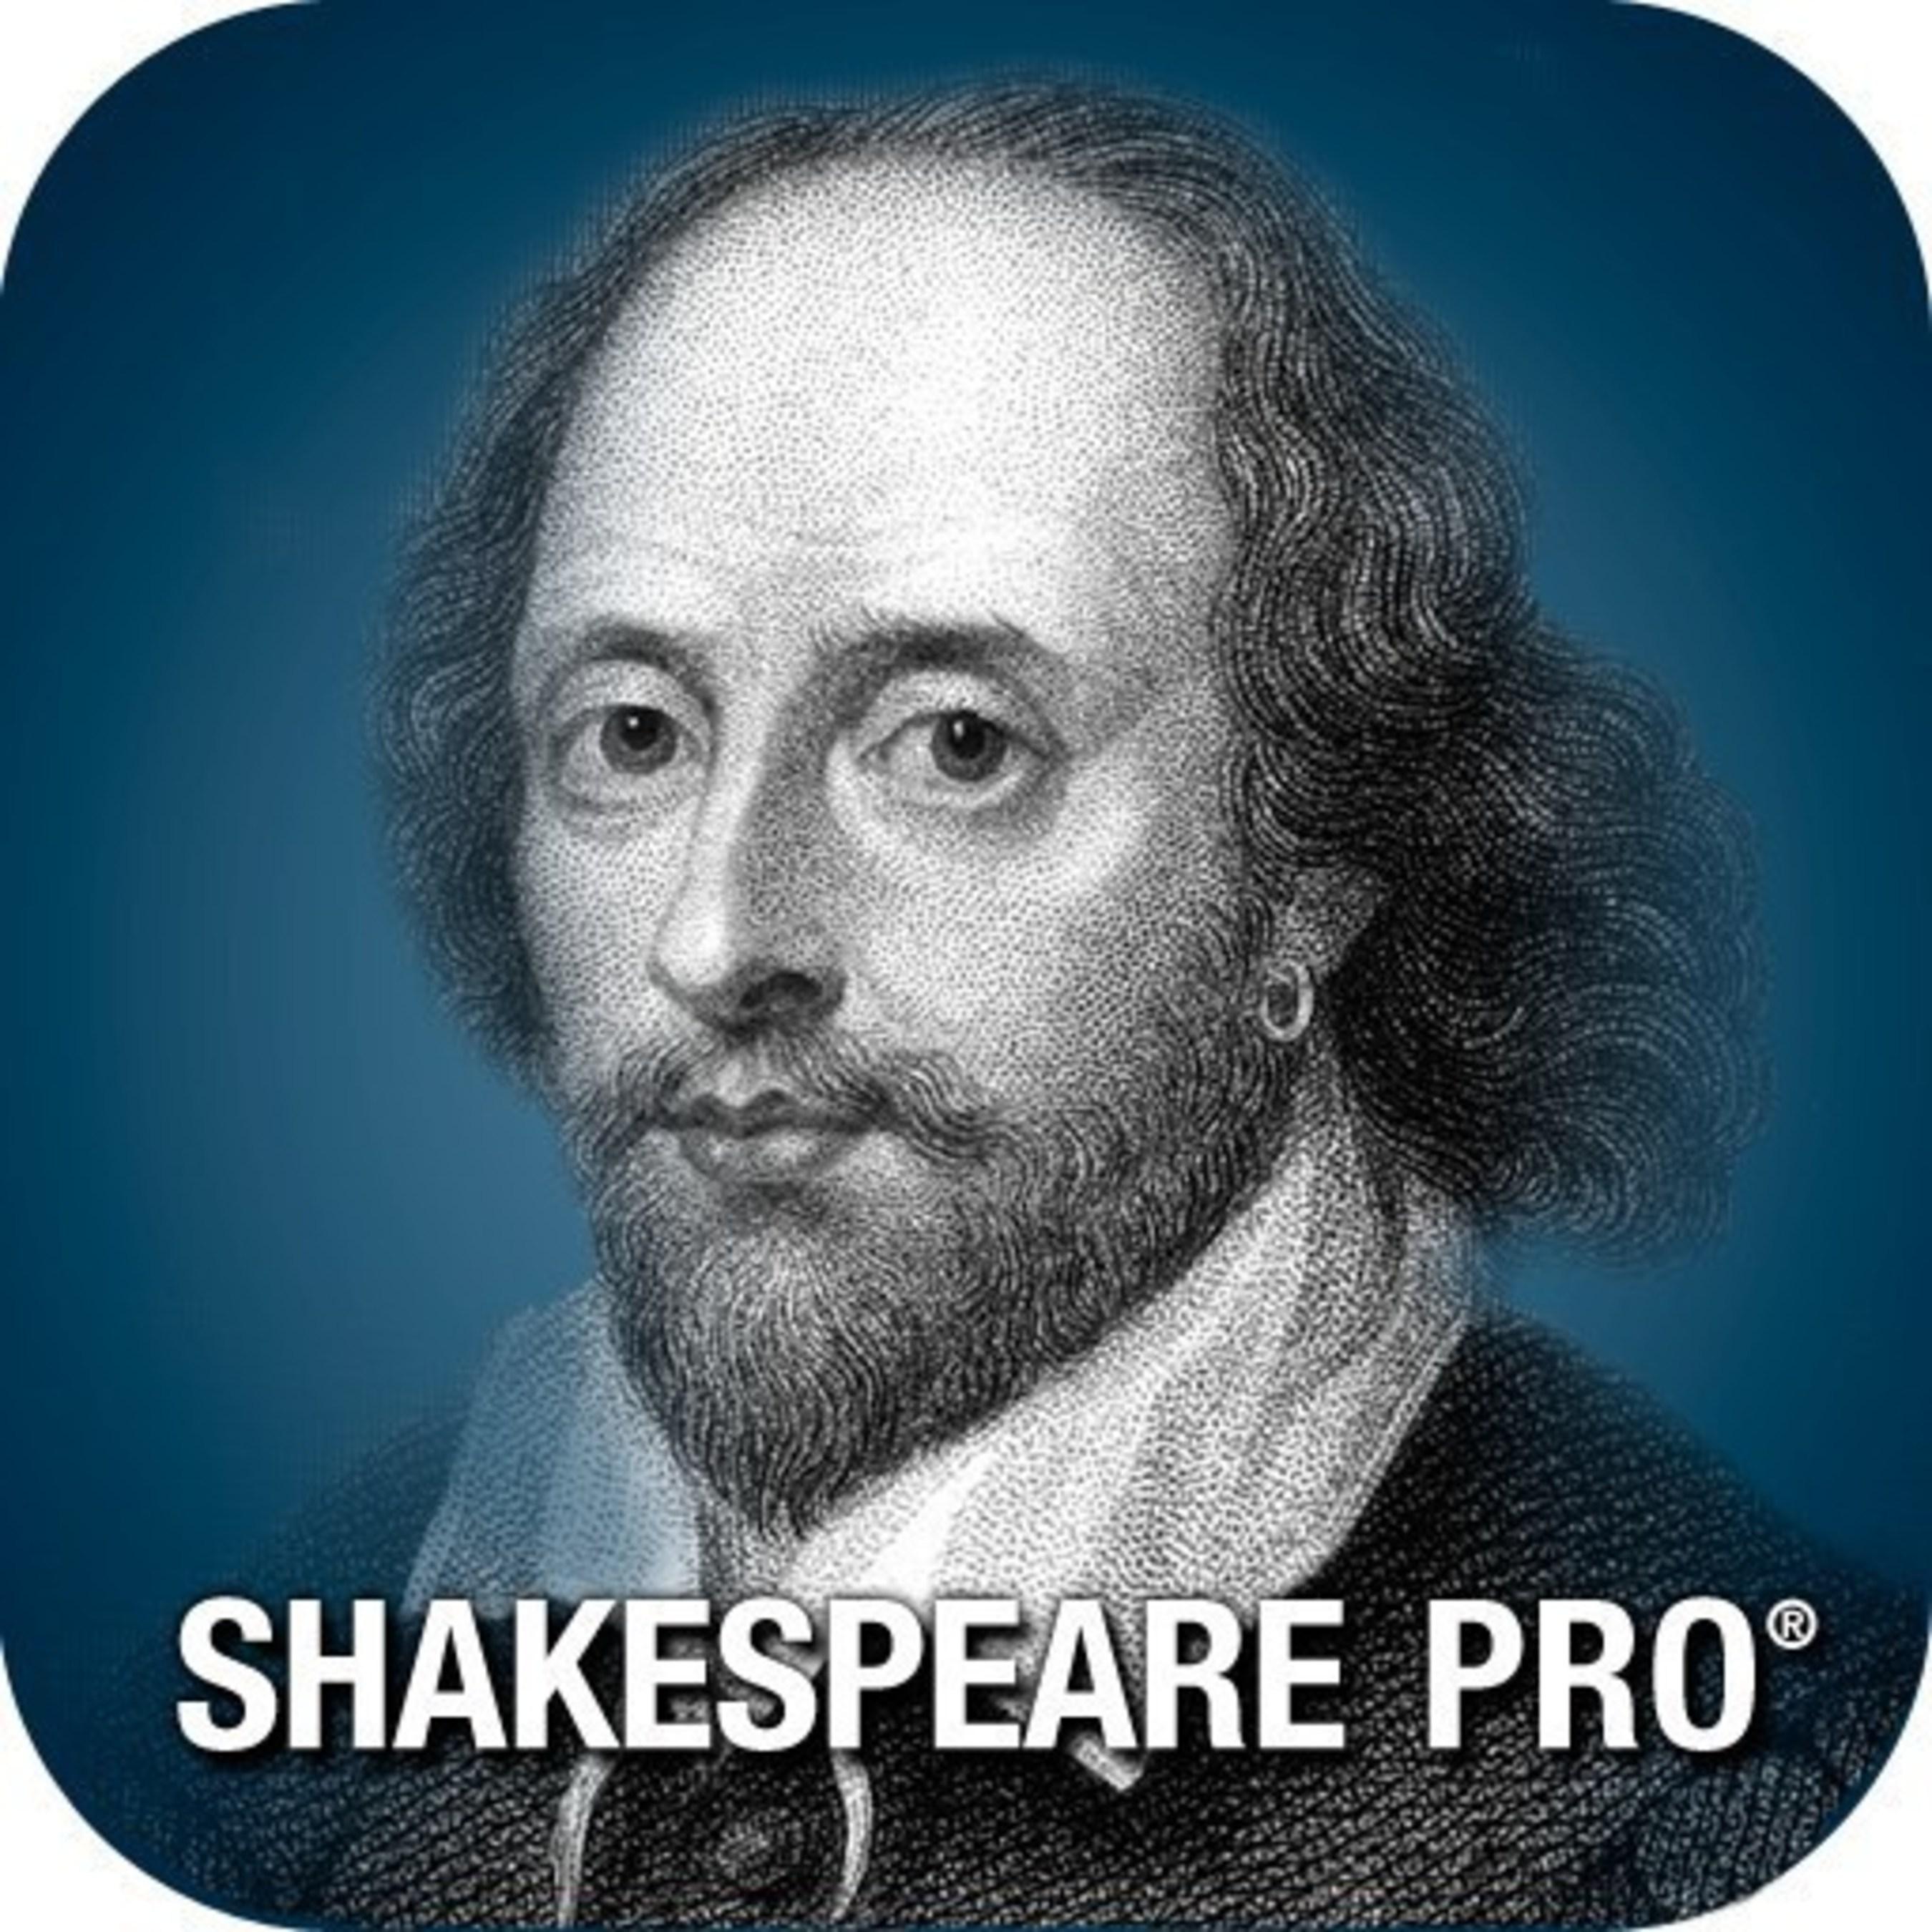 Most Popular Shakespeare App Celebrates 400th Anniversary